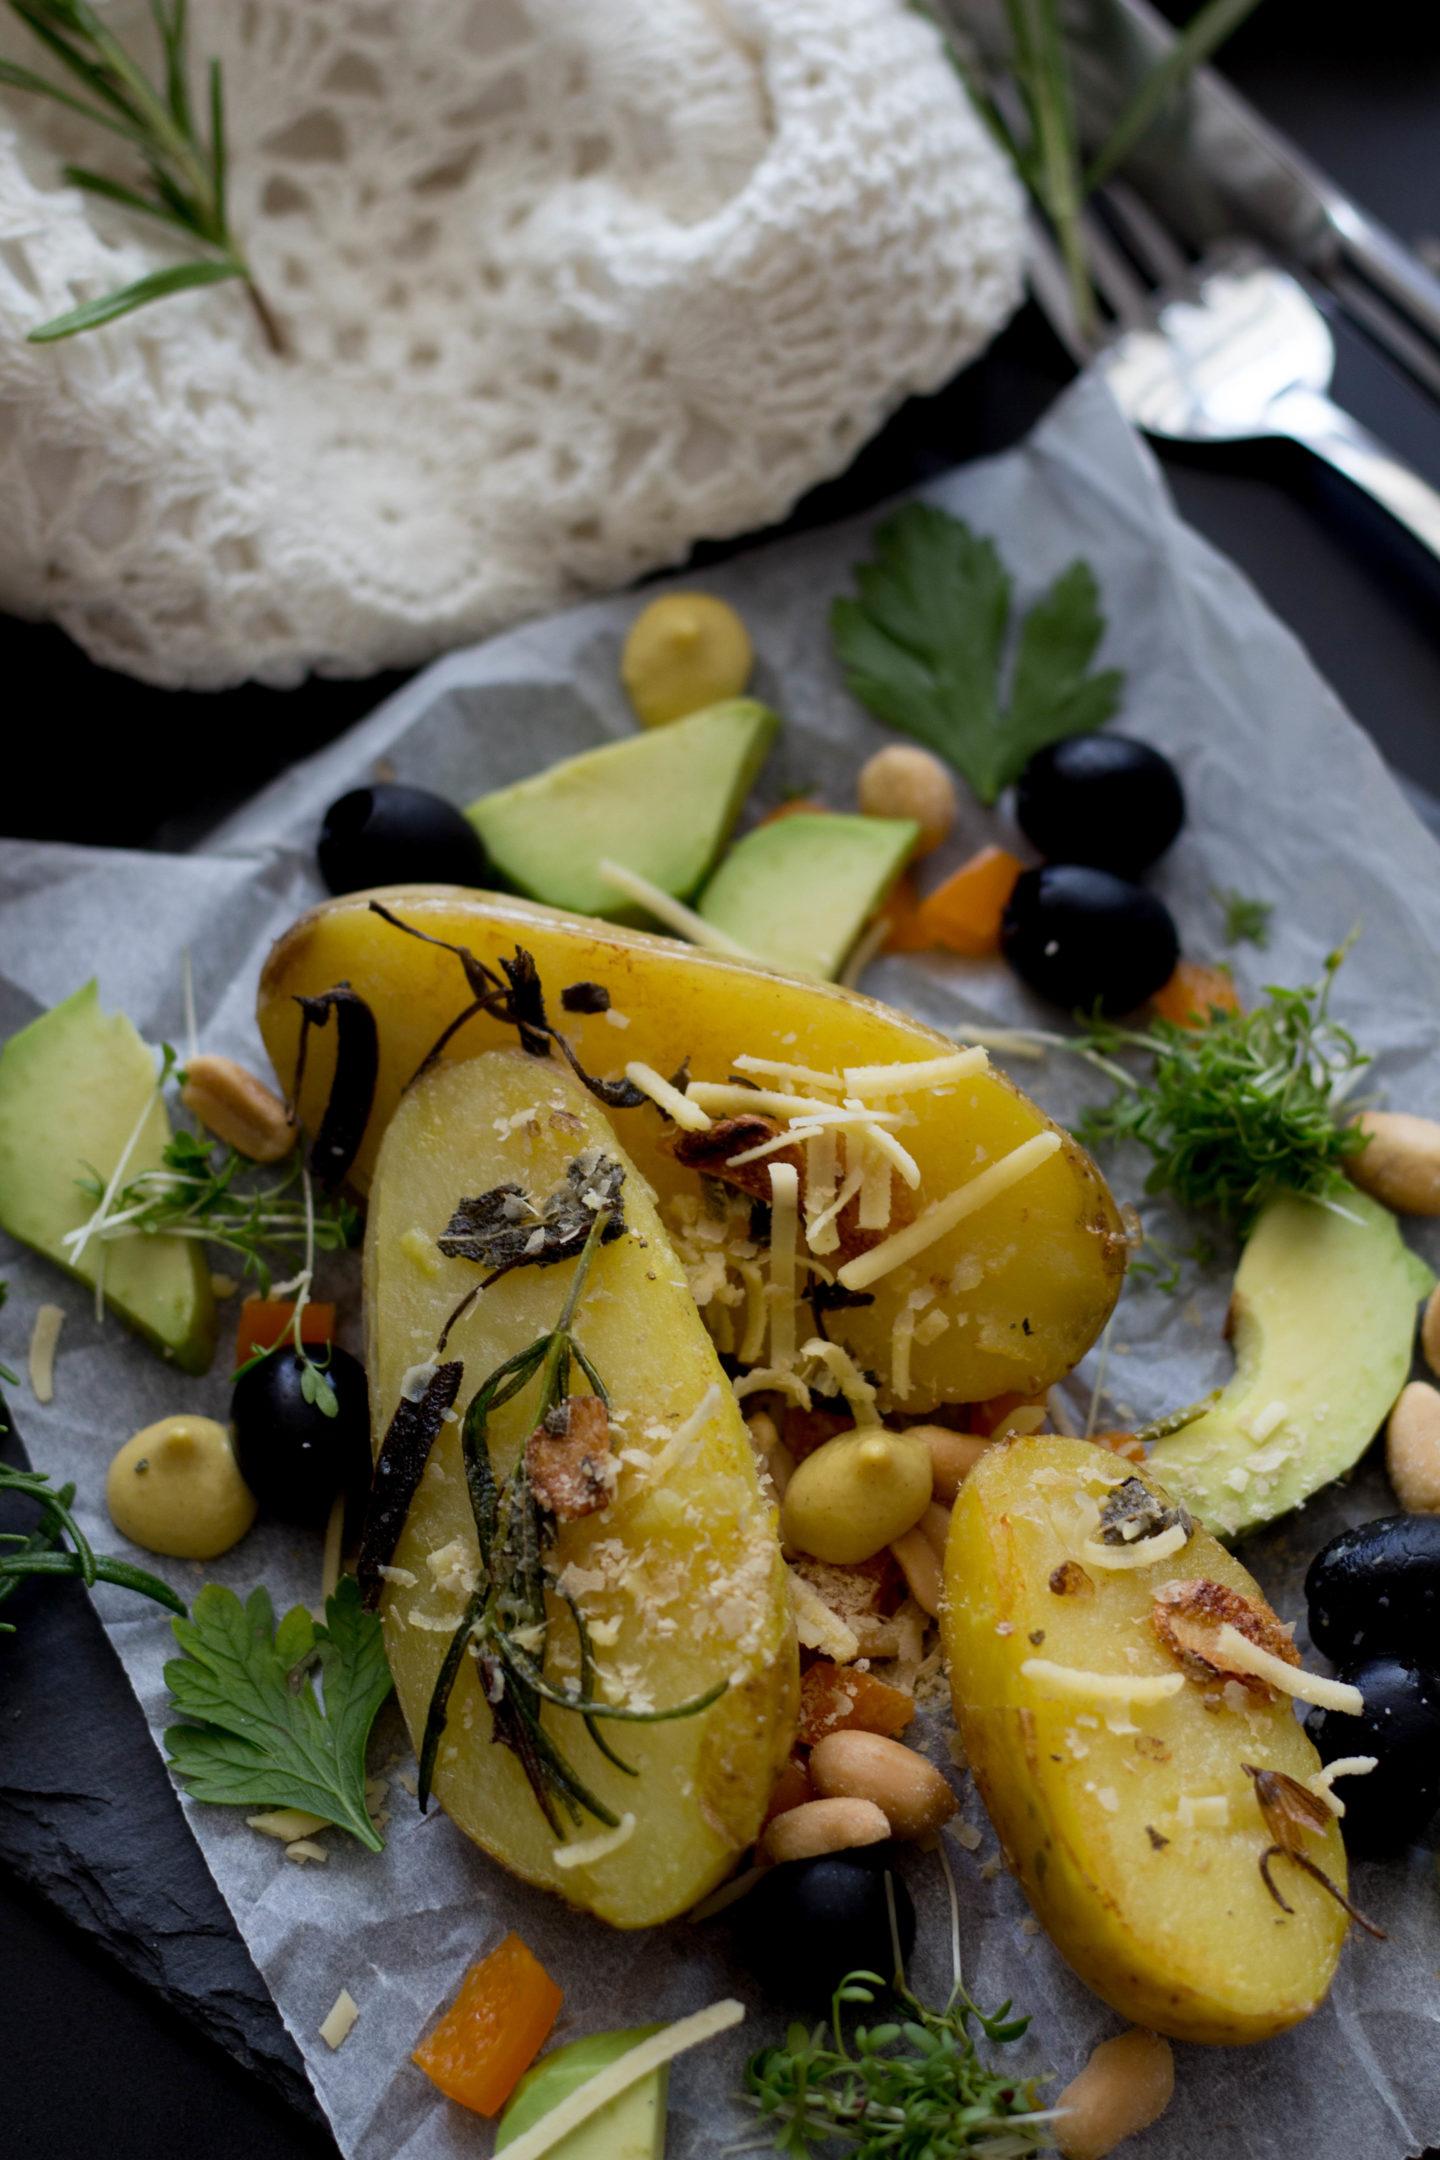 Vegane Sommer Erdäpfel, Kräuterbutter, Homespa, Schnelle Küche, Clean eating,